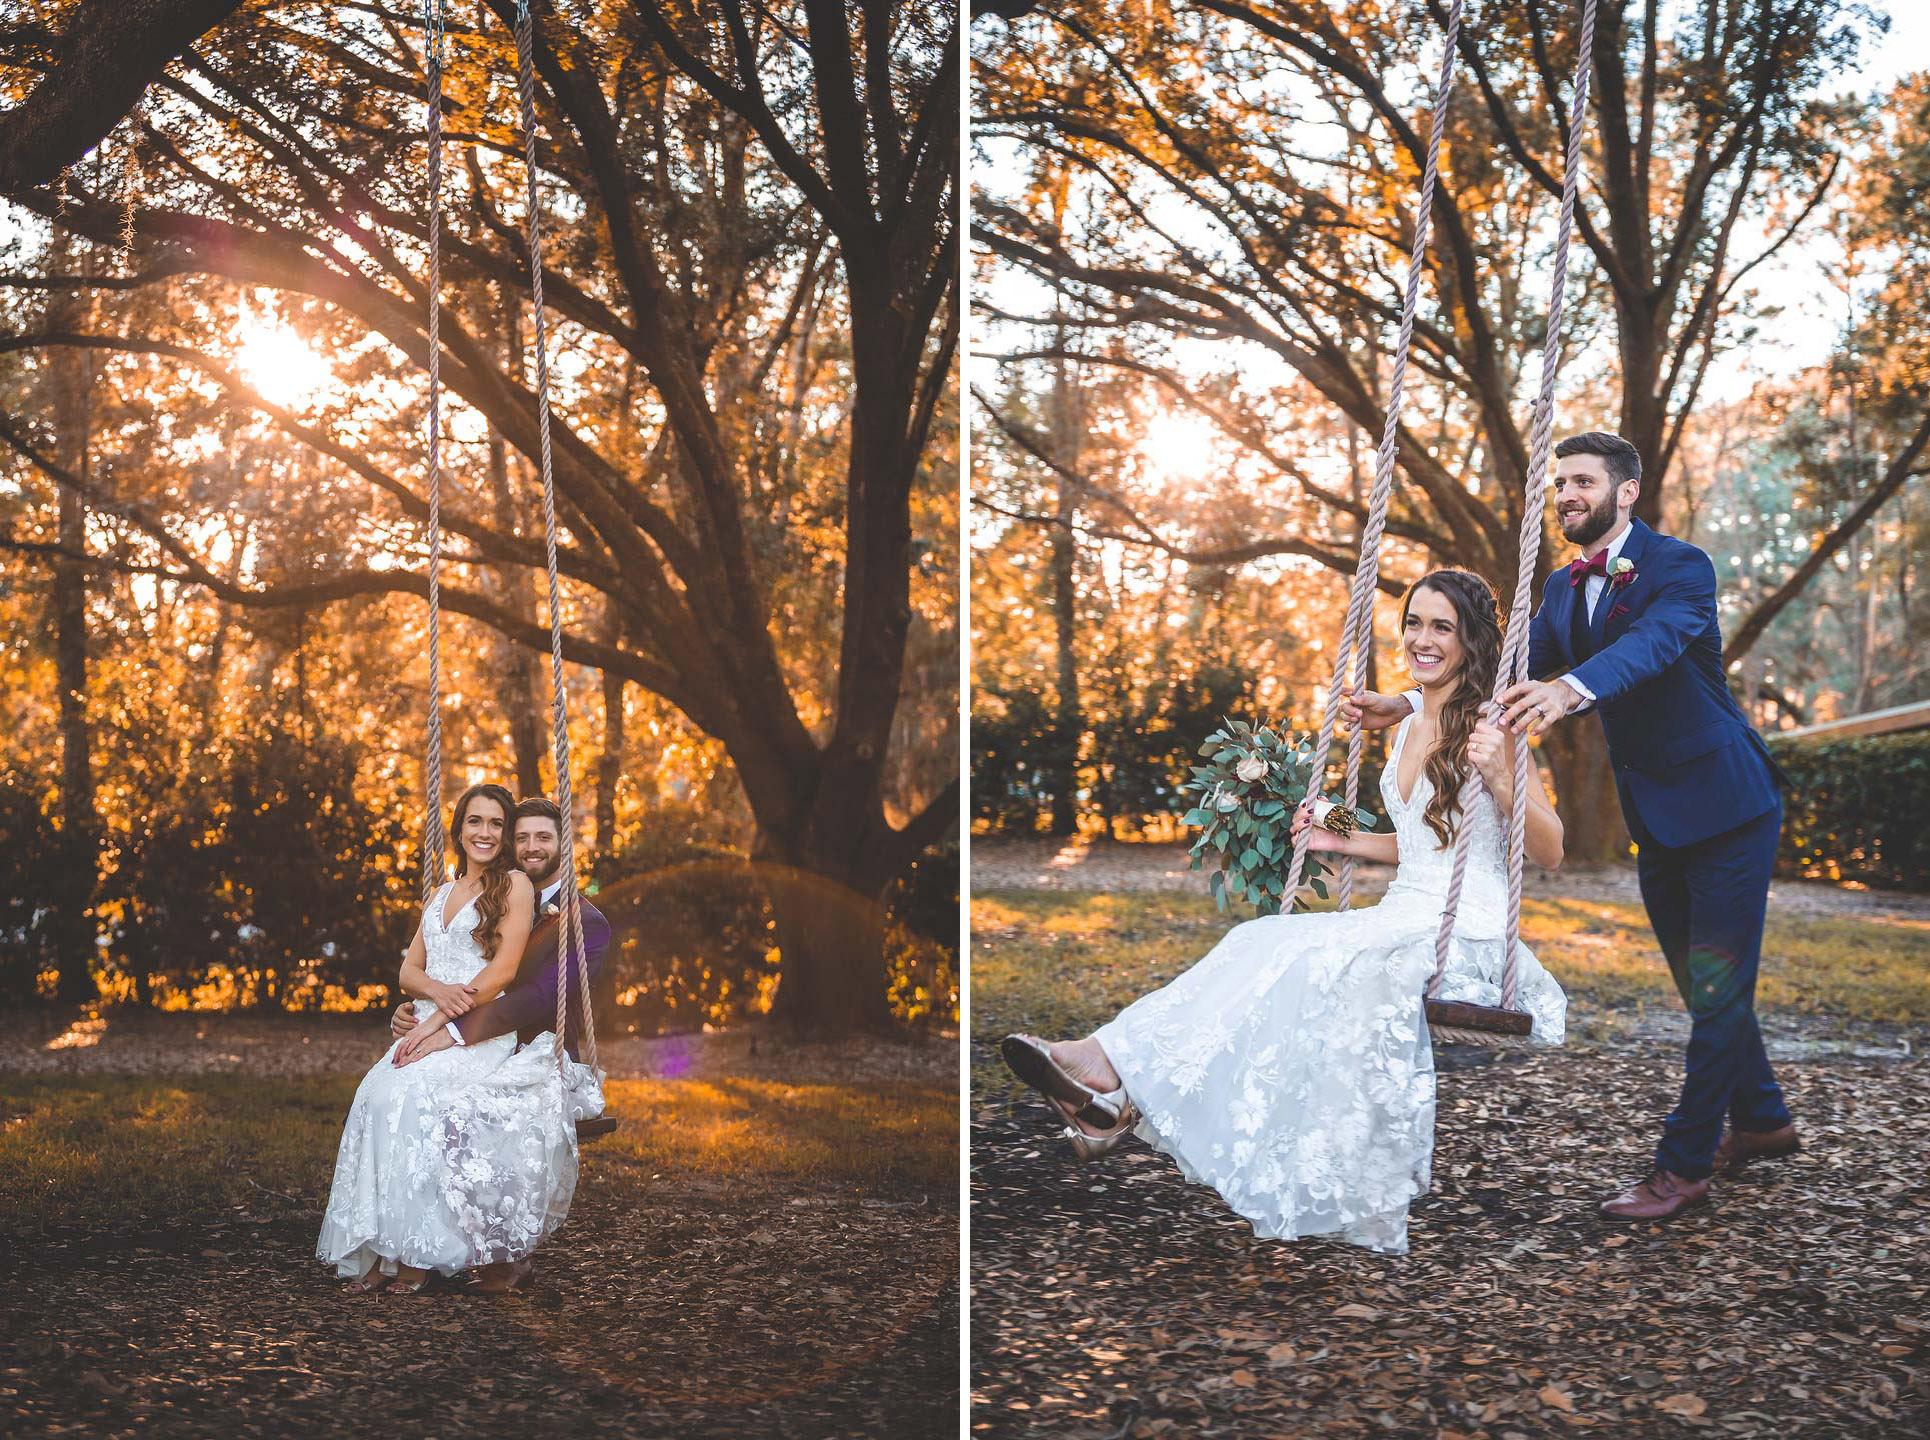 adam-szarmack-bowing-oaks-wedding-photographer-jacksonville-103.jpg